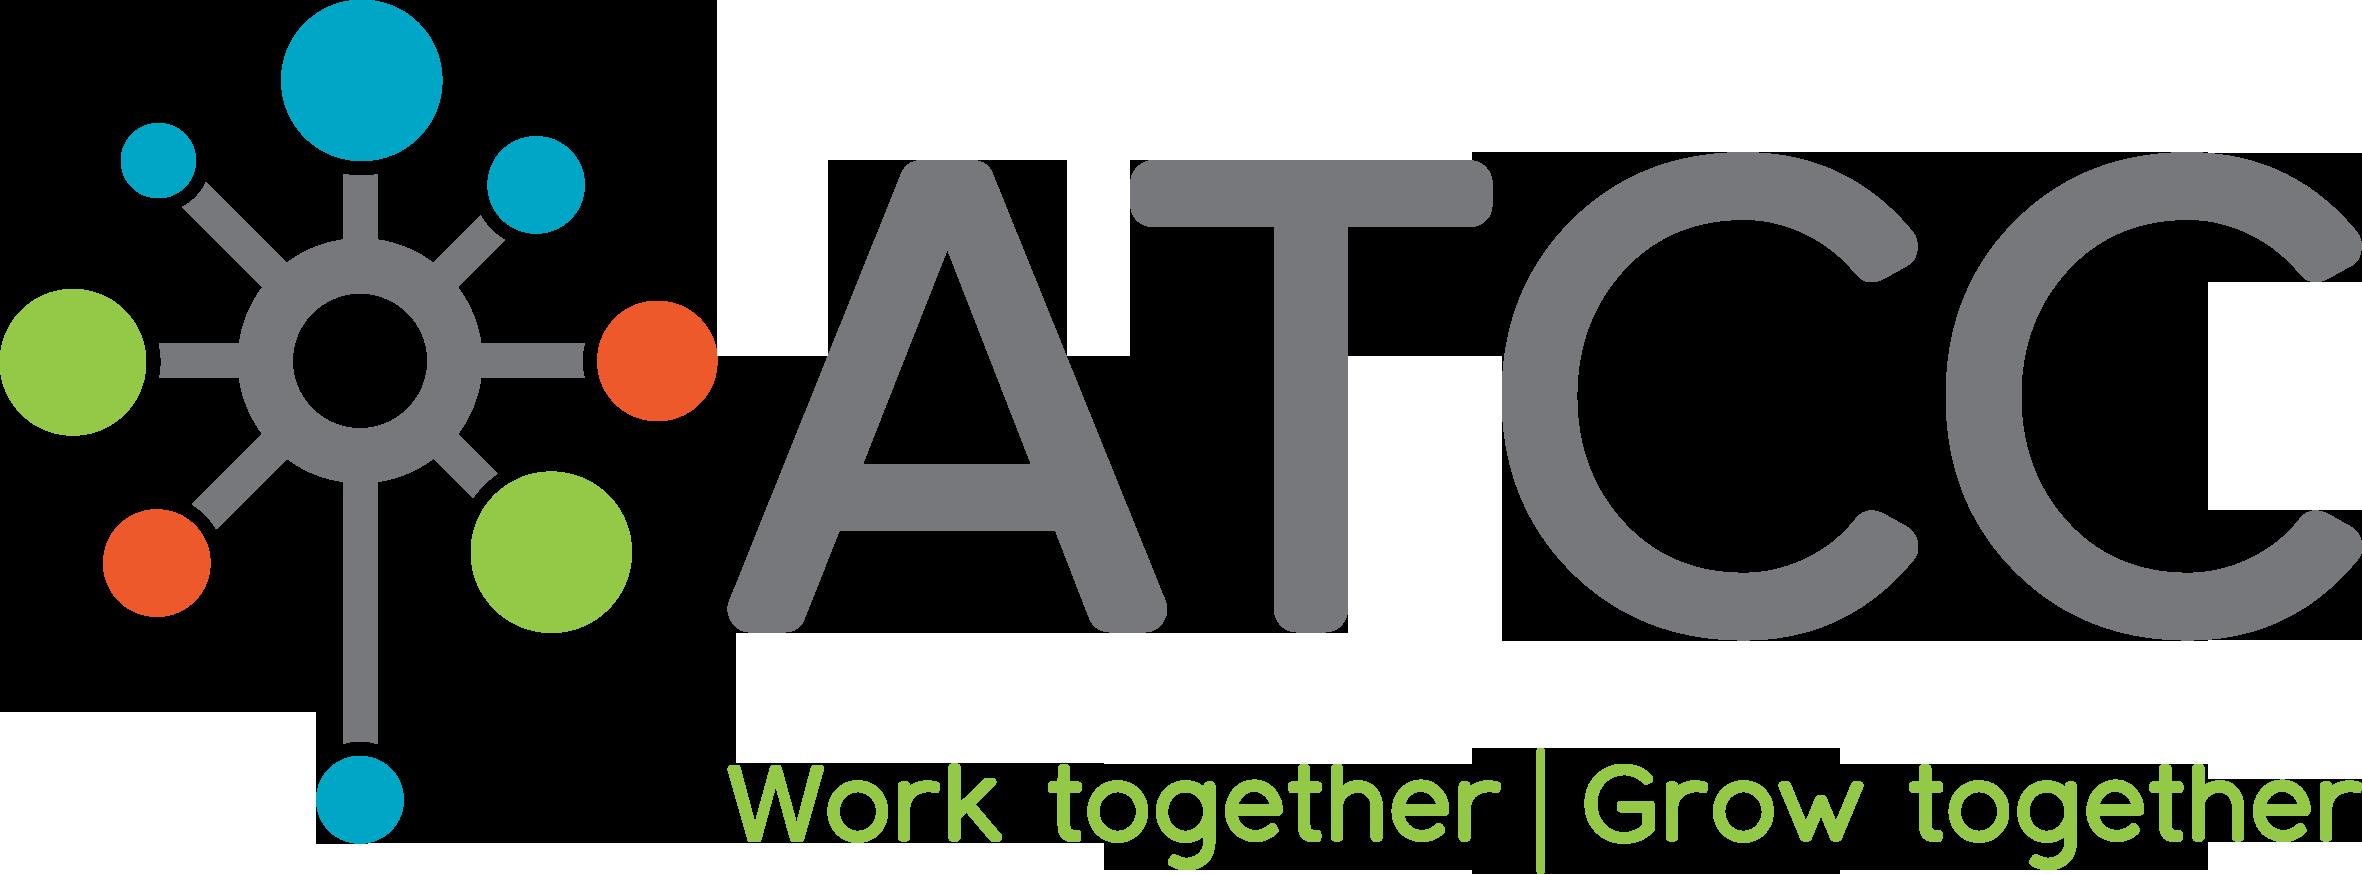 Atherton Tableland Chamber of Commerce Inc